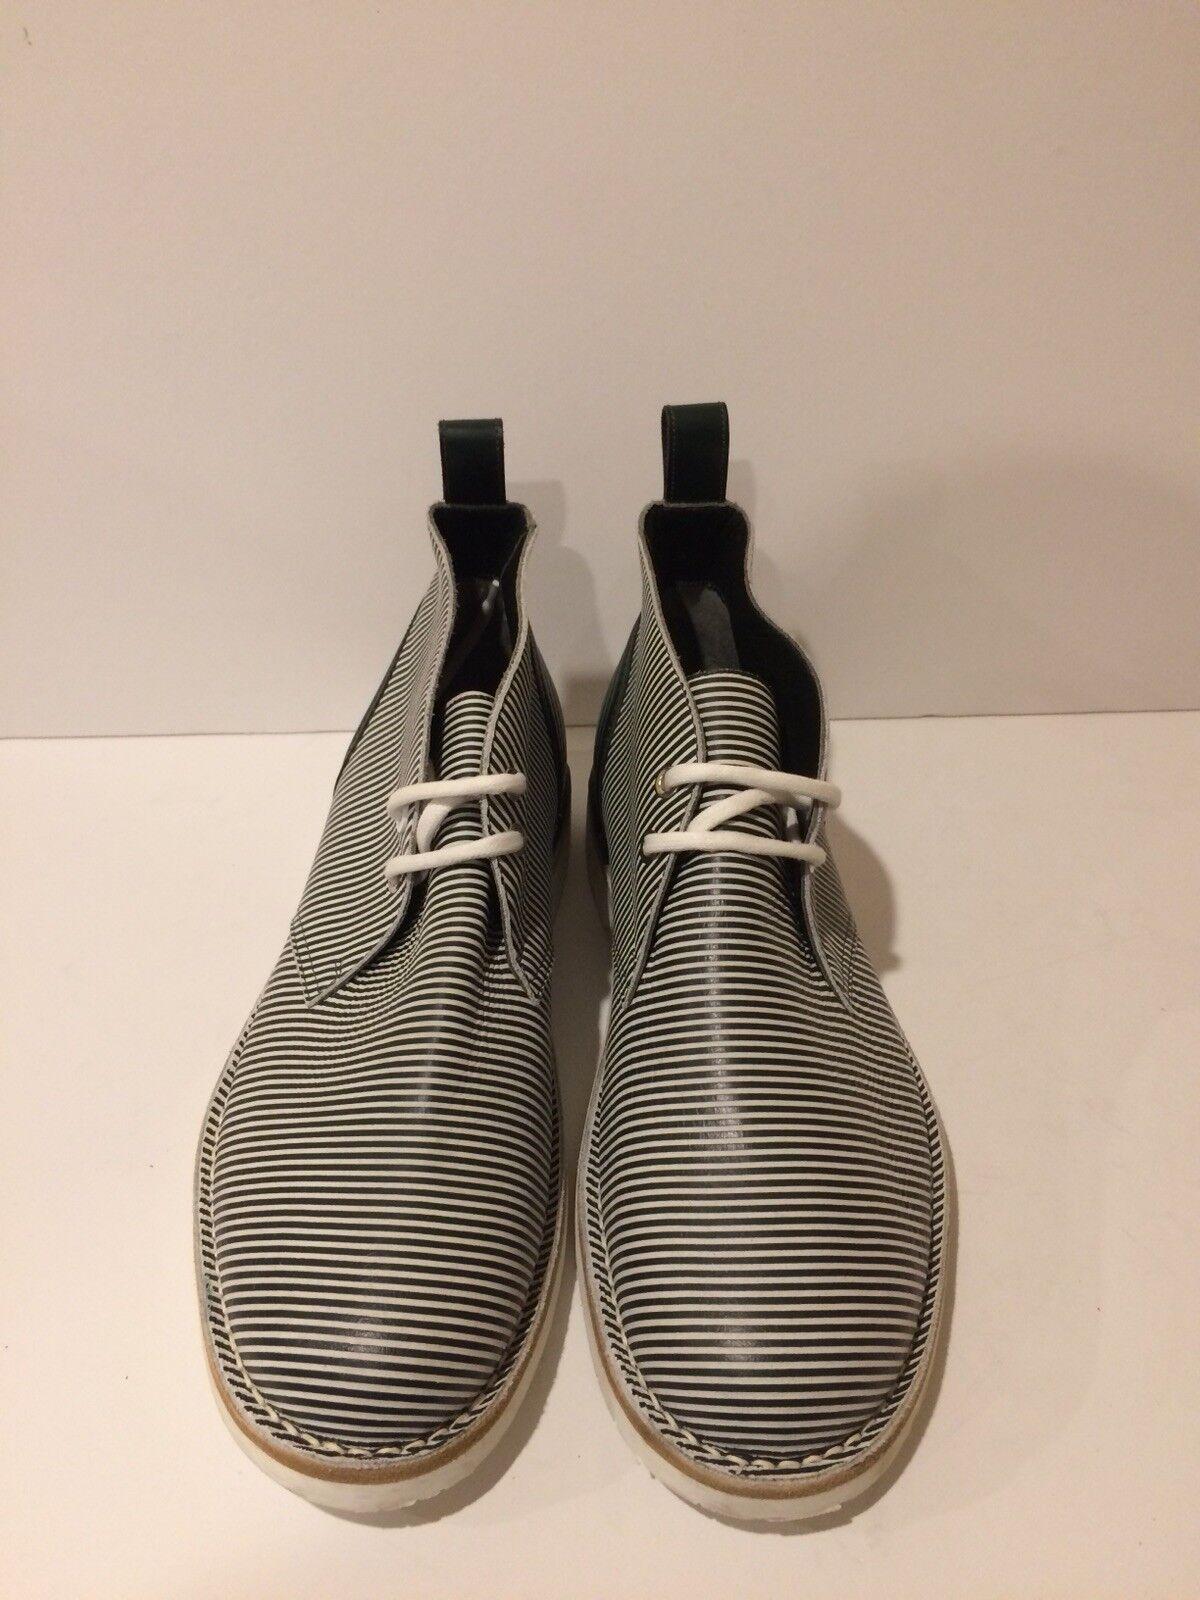 Jimmy Choo New Calf Leather Striped Oxford Ankle stivali (43EU Men's)